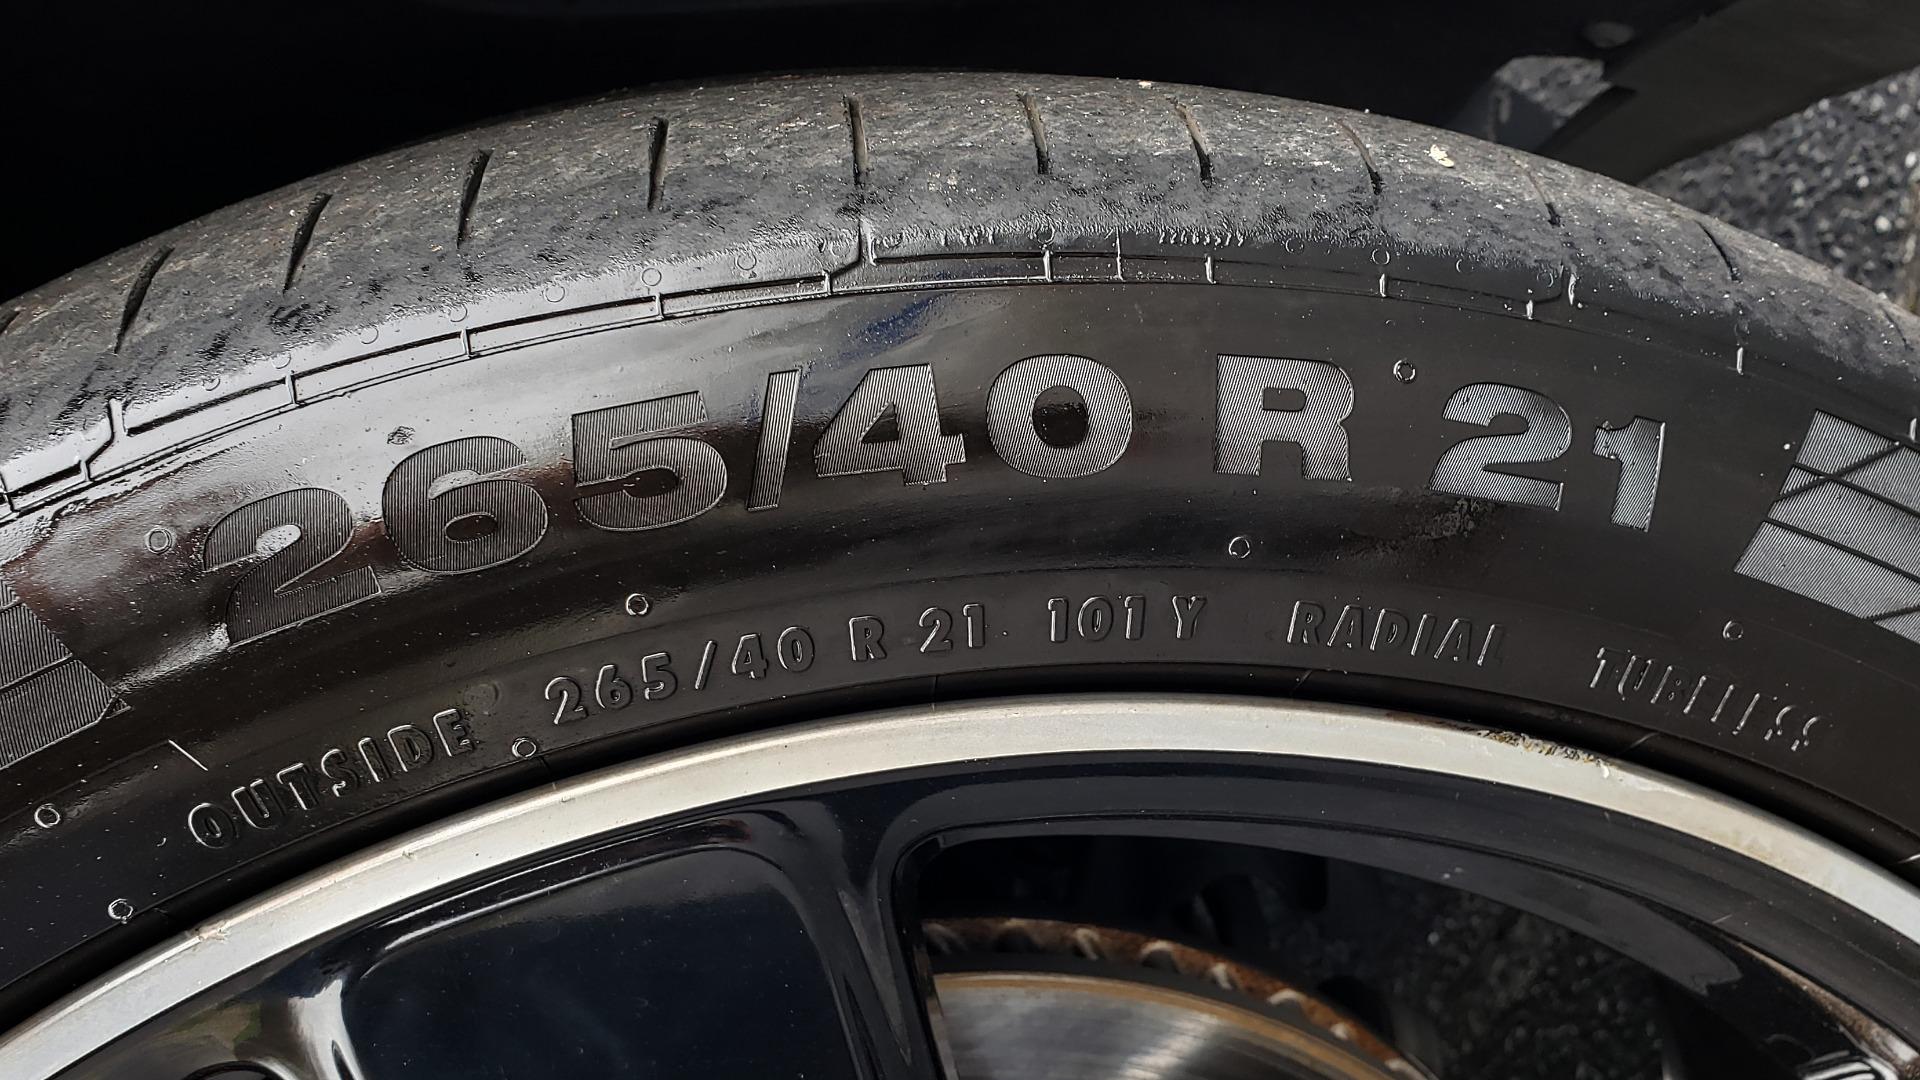 Used 2016 Porsche MACAN TURBO / PREM / NAV / PARK ASST / BOSE / PDK / CHRONO PKG for sale Sold at Formula Imports in Charlotte NC 28227 87